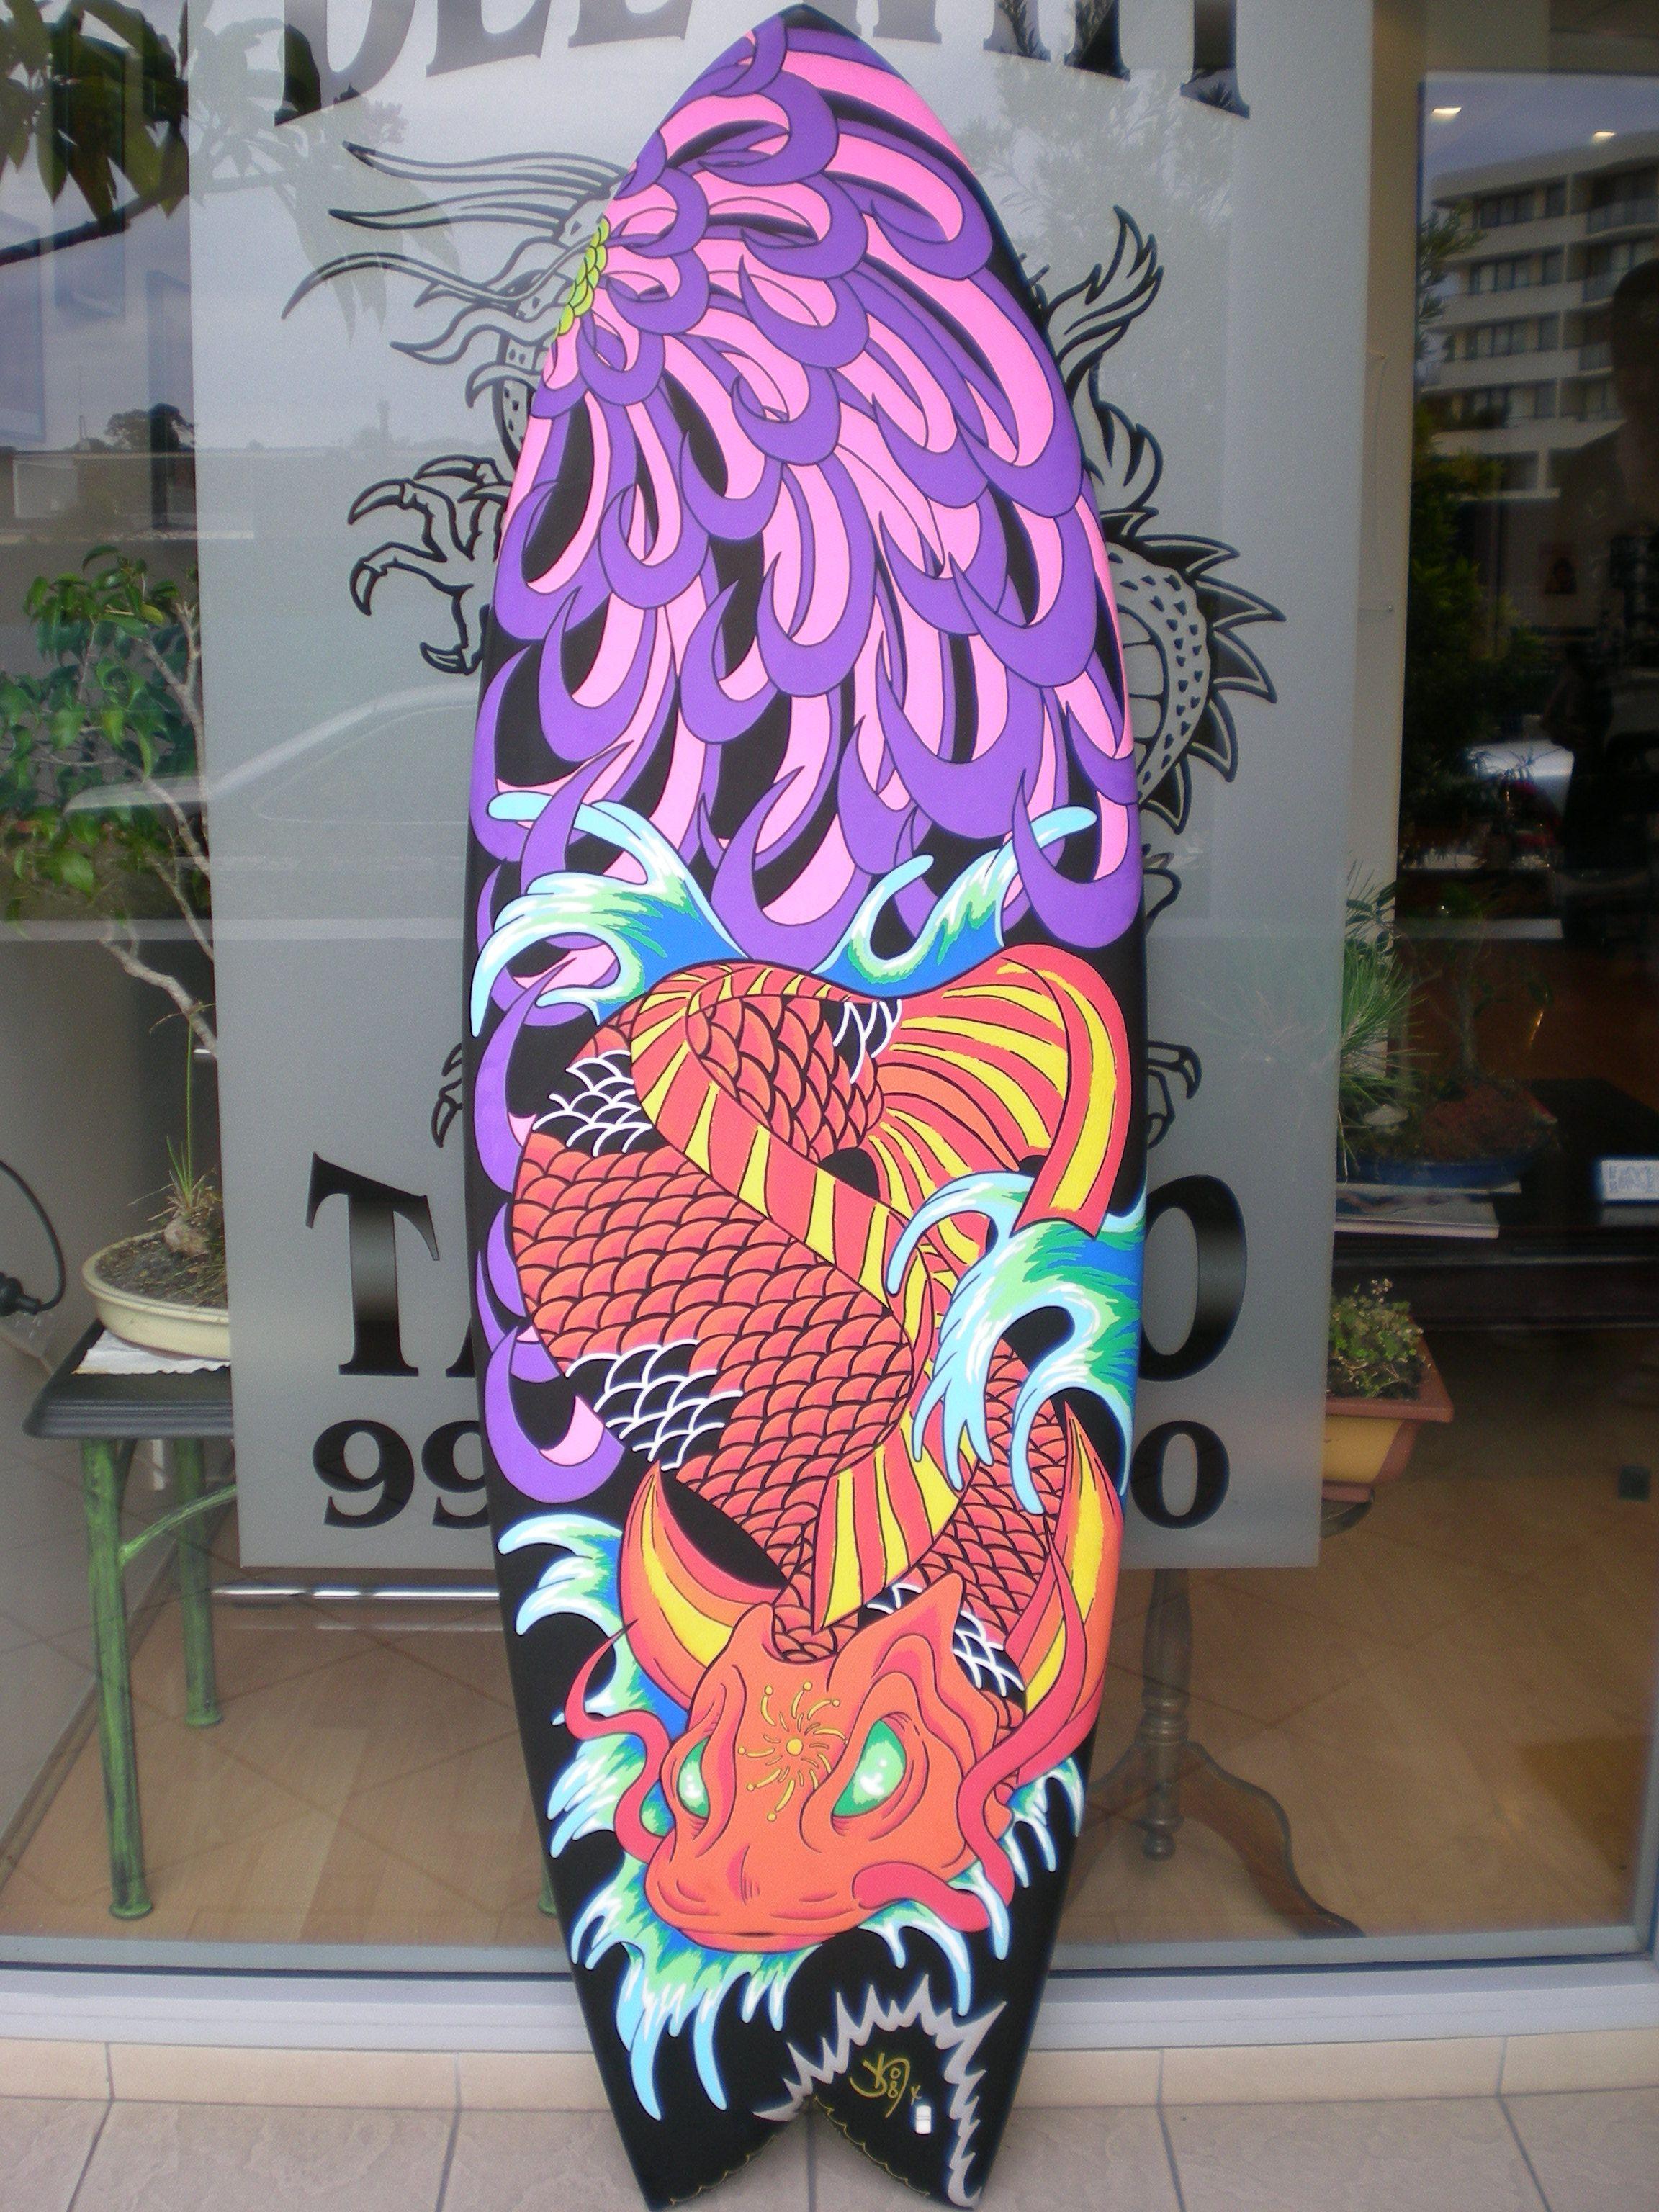 Australian Art Surfboard Designs - Koi & Chrysanthemum Surfboard -